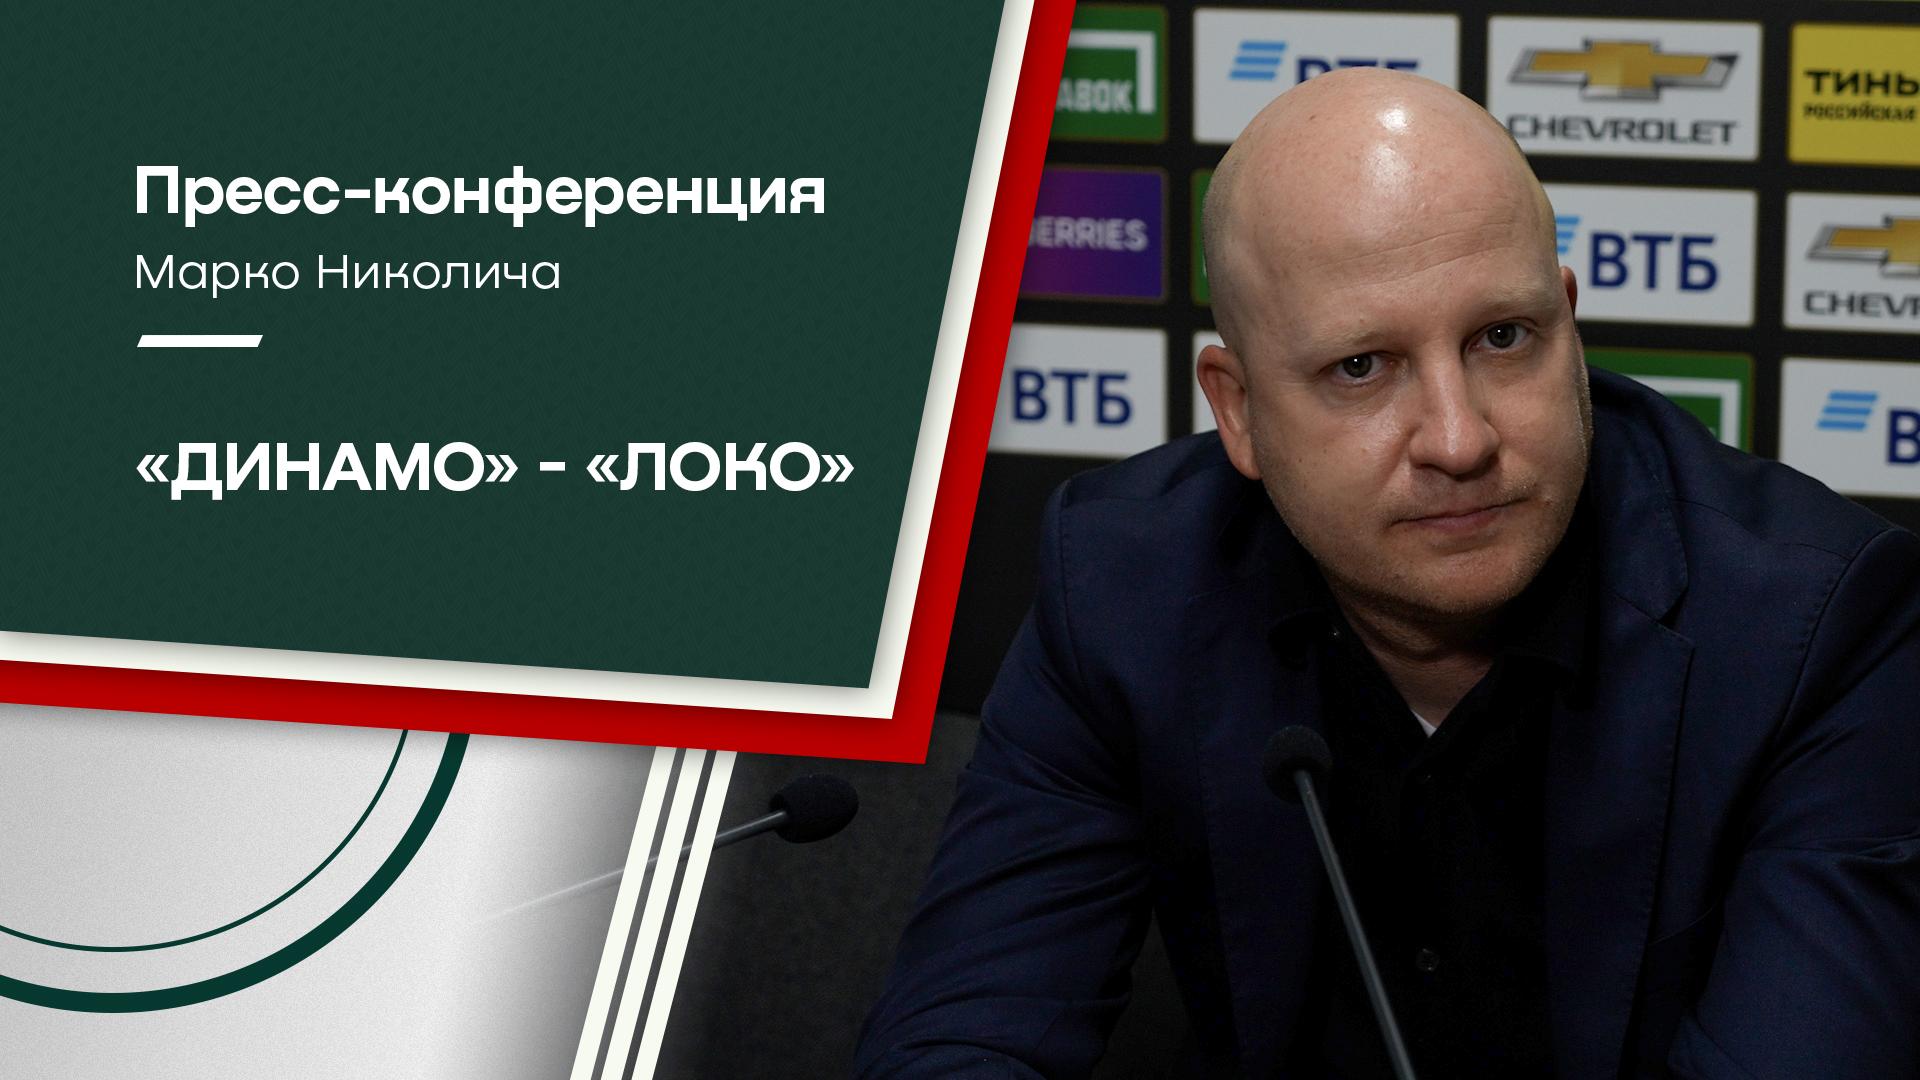 Пресс-конференция Марко Николича после матча с «Динамо»